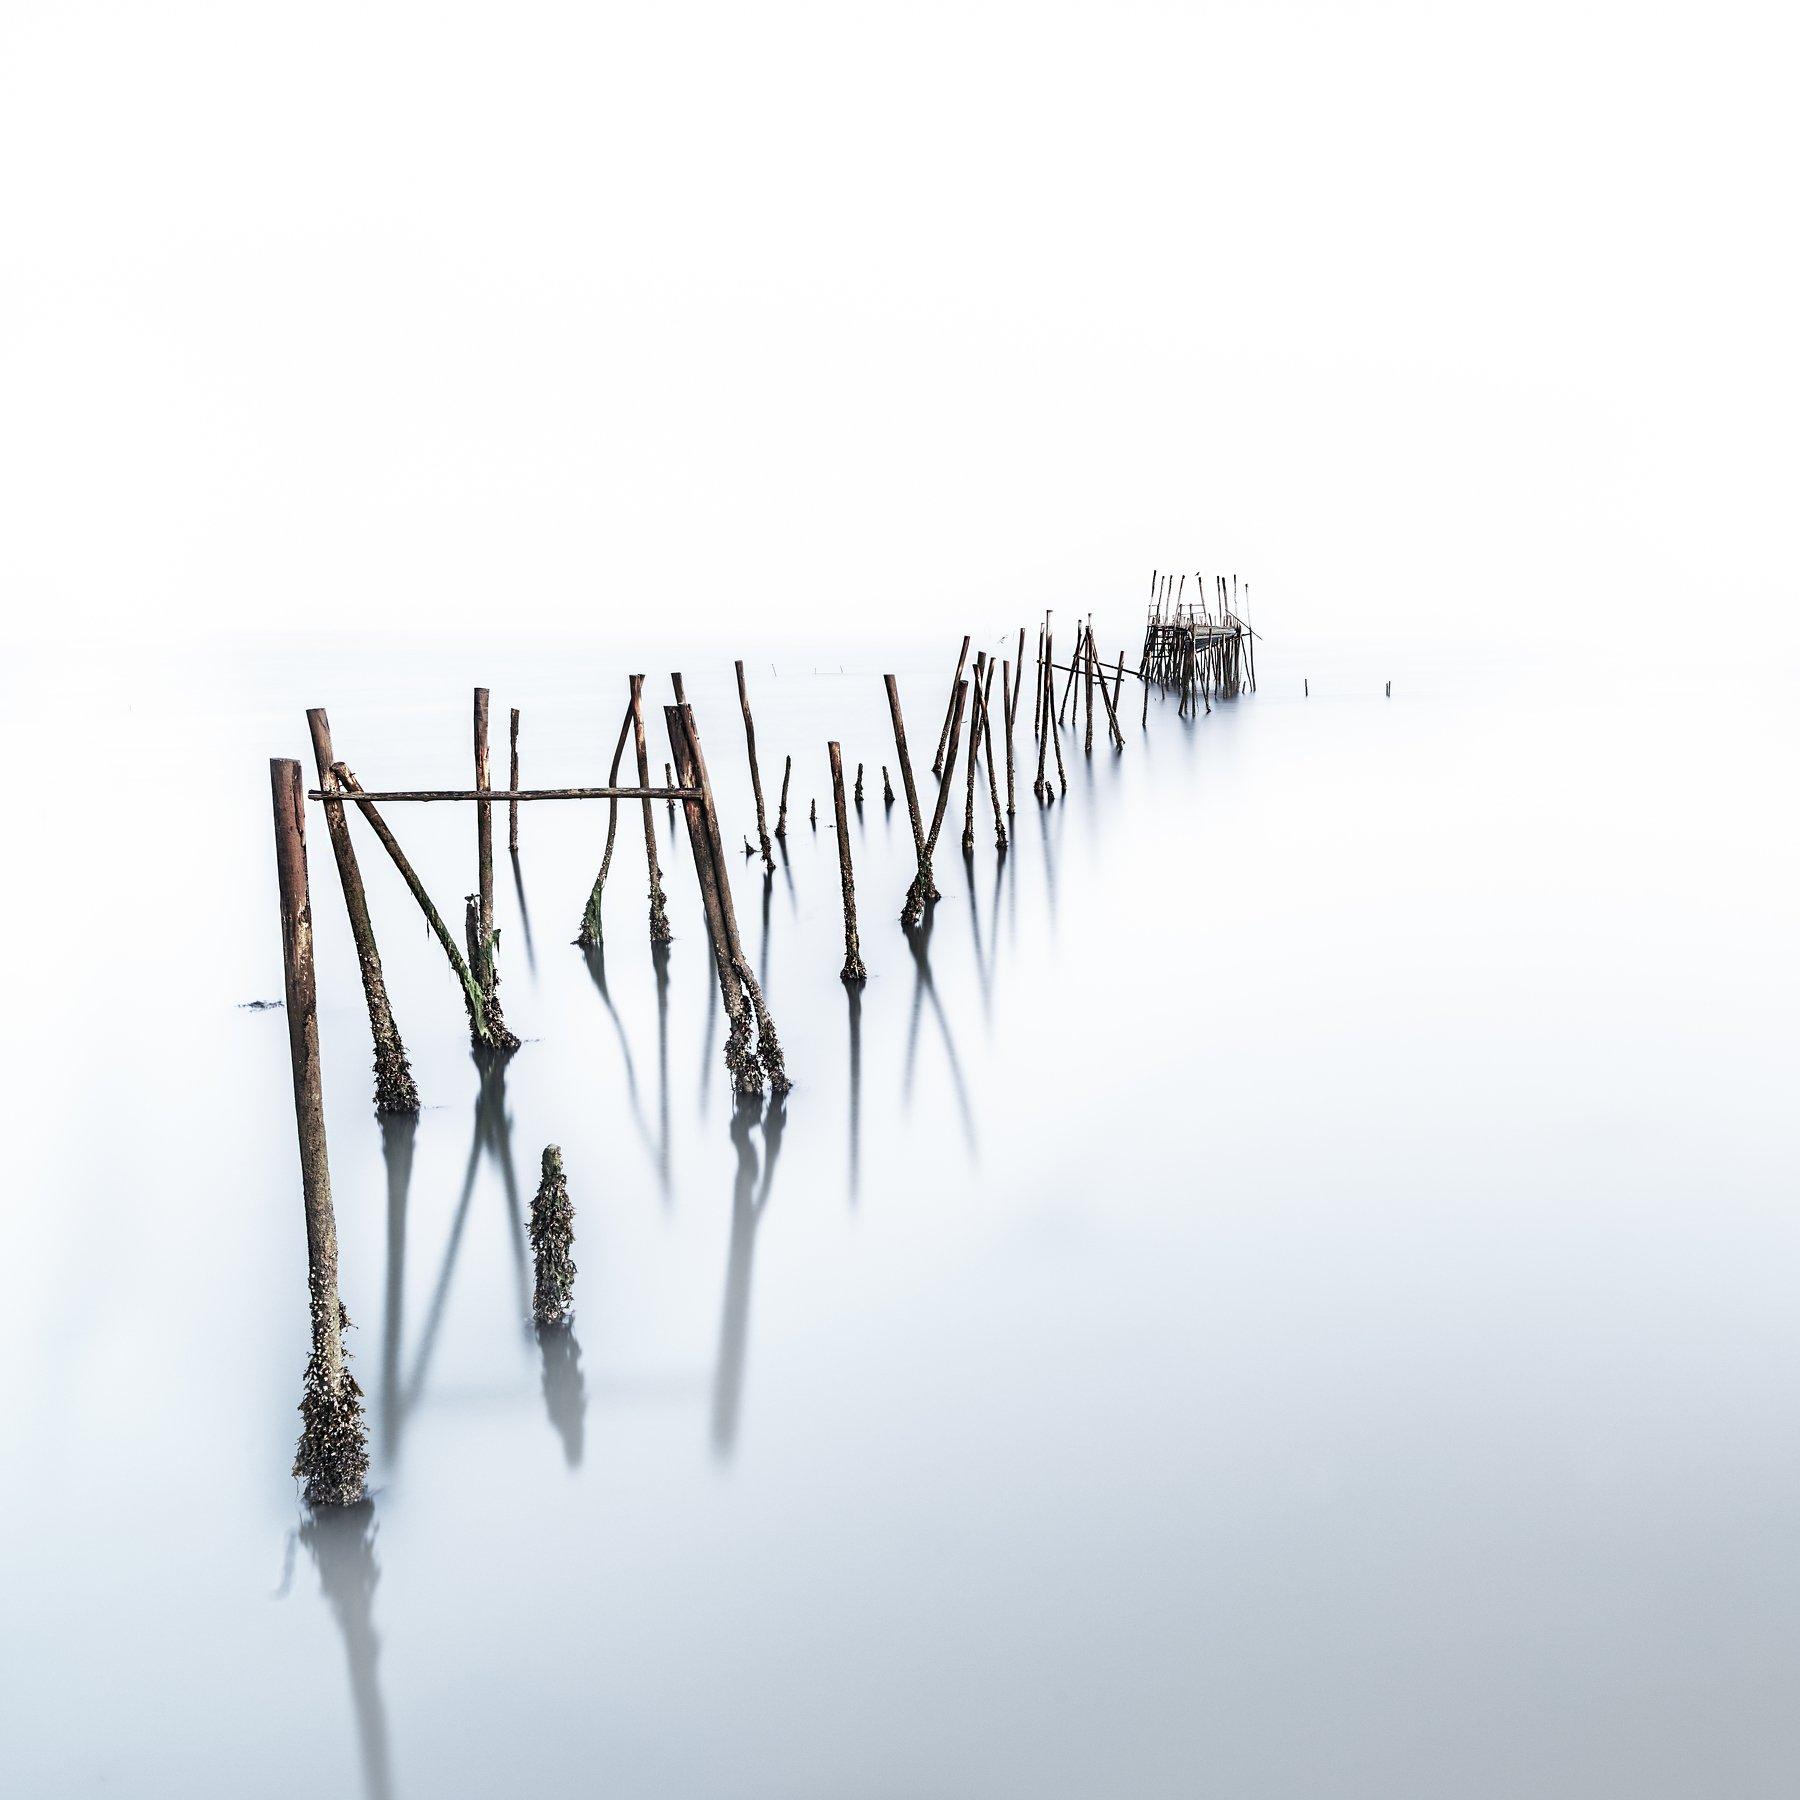 long exposure,zeiss,old bridge,fog,morning,minimalistic,felix ostapenko,nikon,, Felix Ostapenko